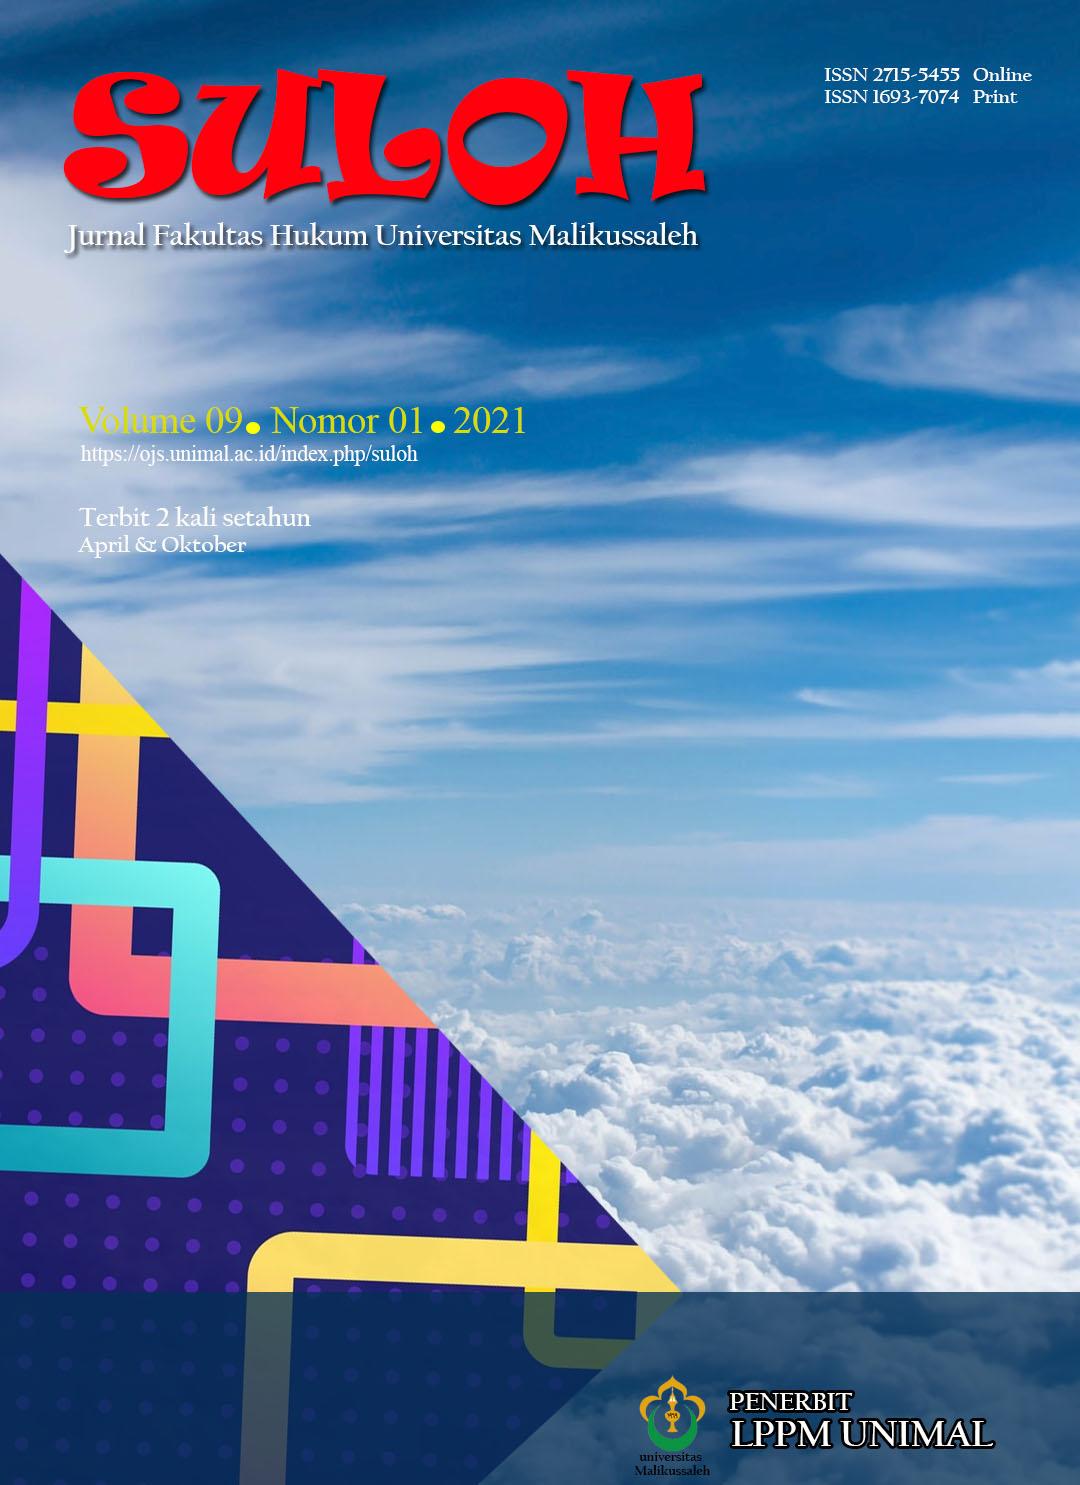 Suloh: Jurnal Fakultas Hukum Universitas Malikussaleh